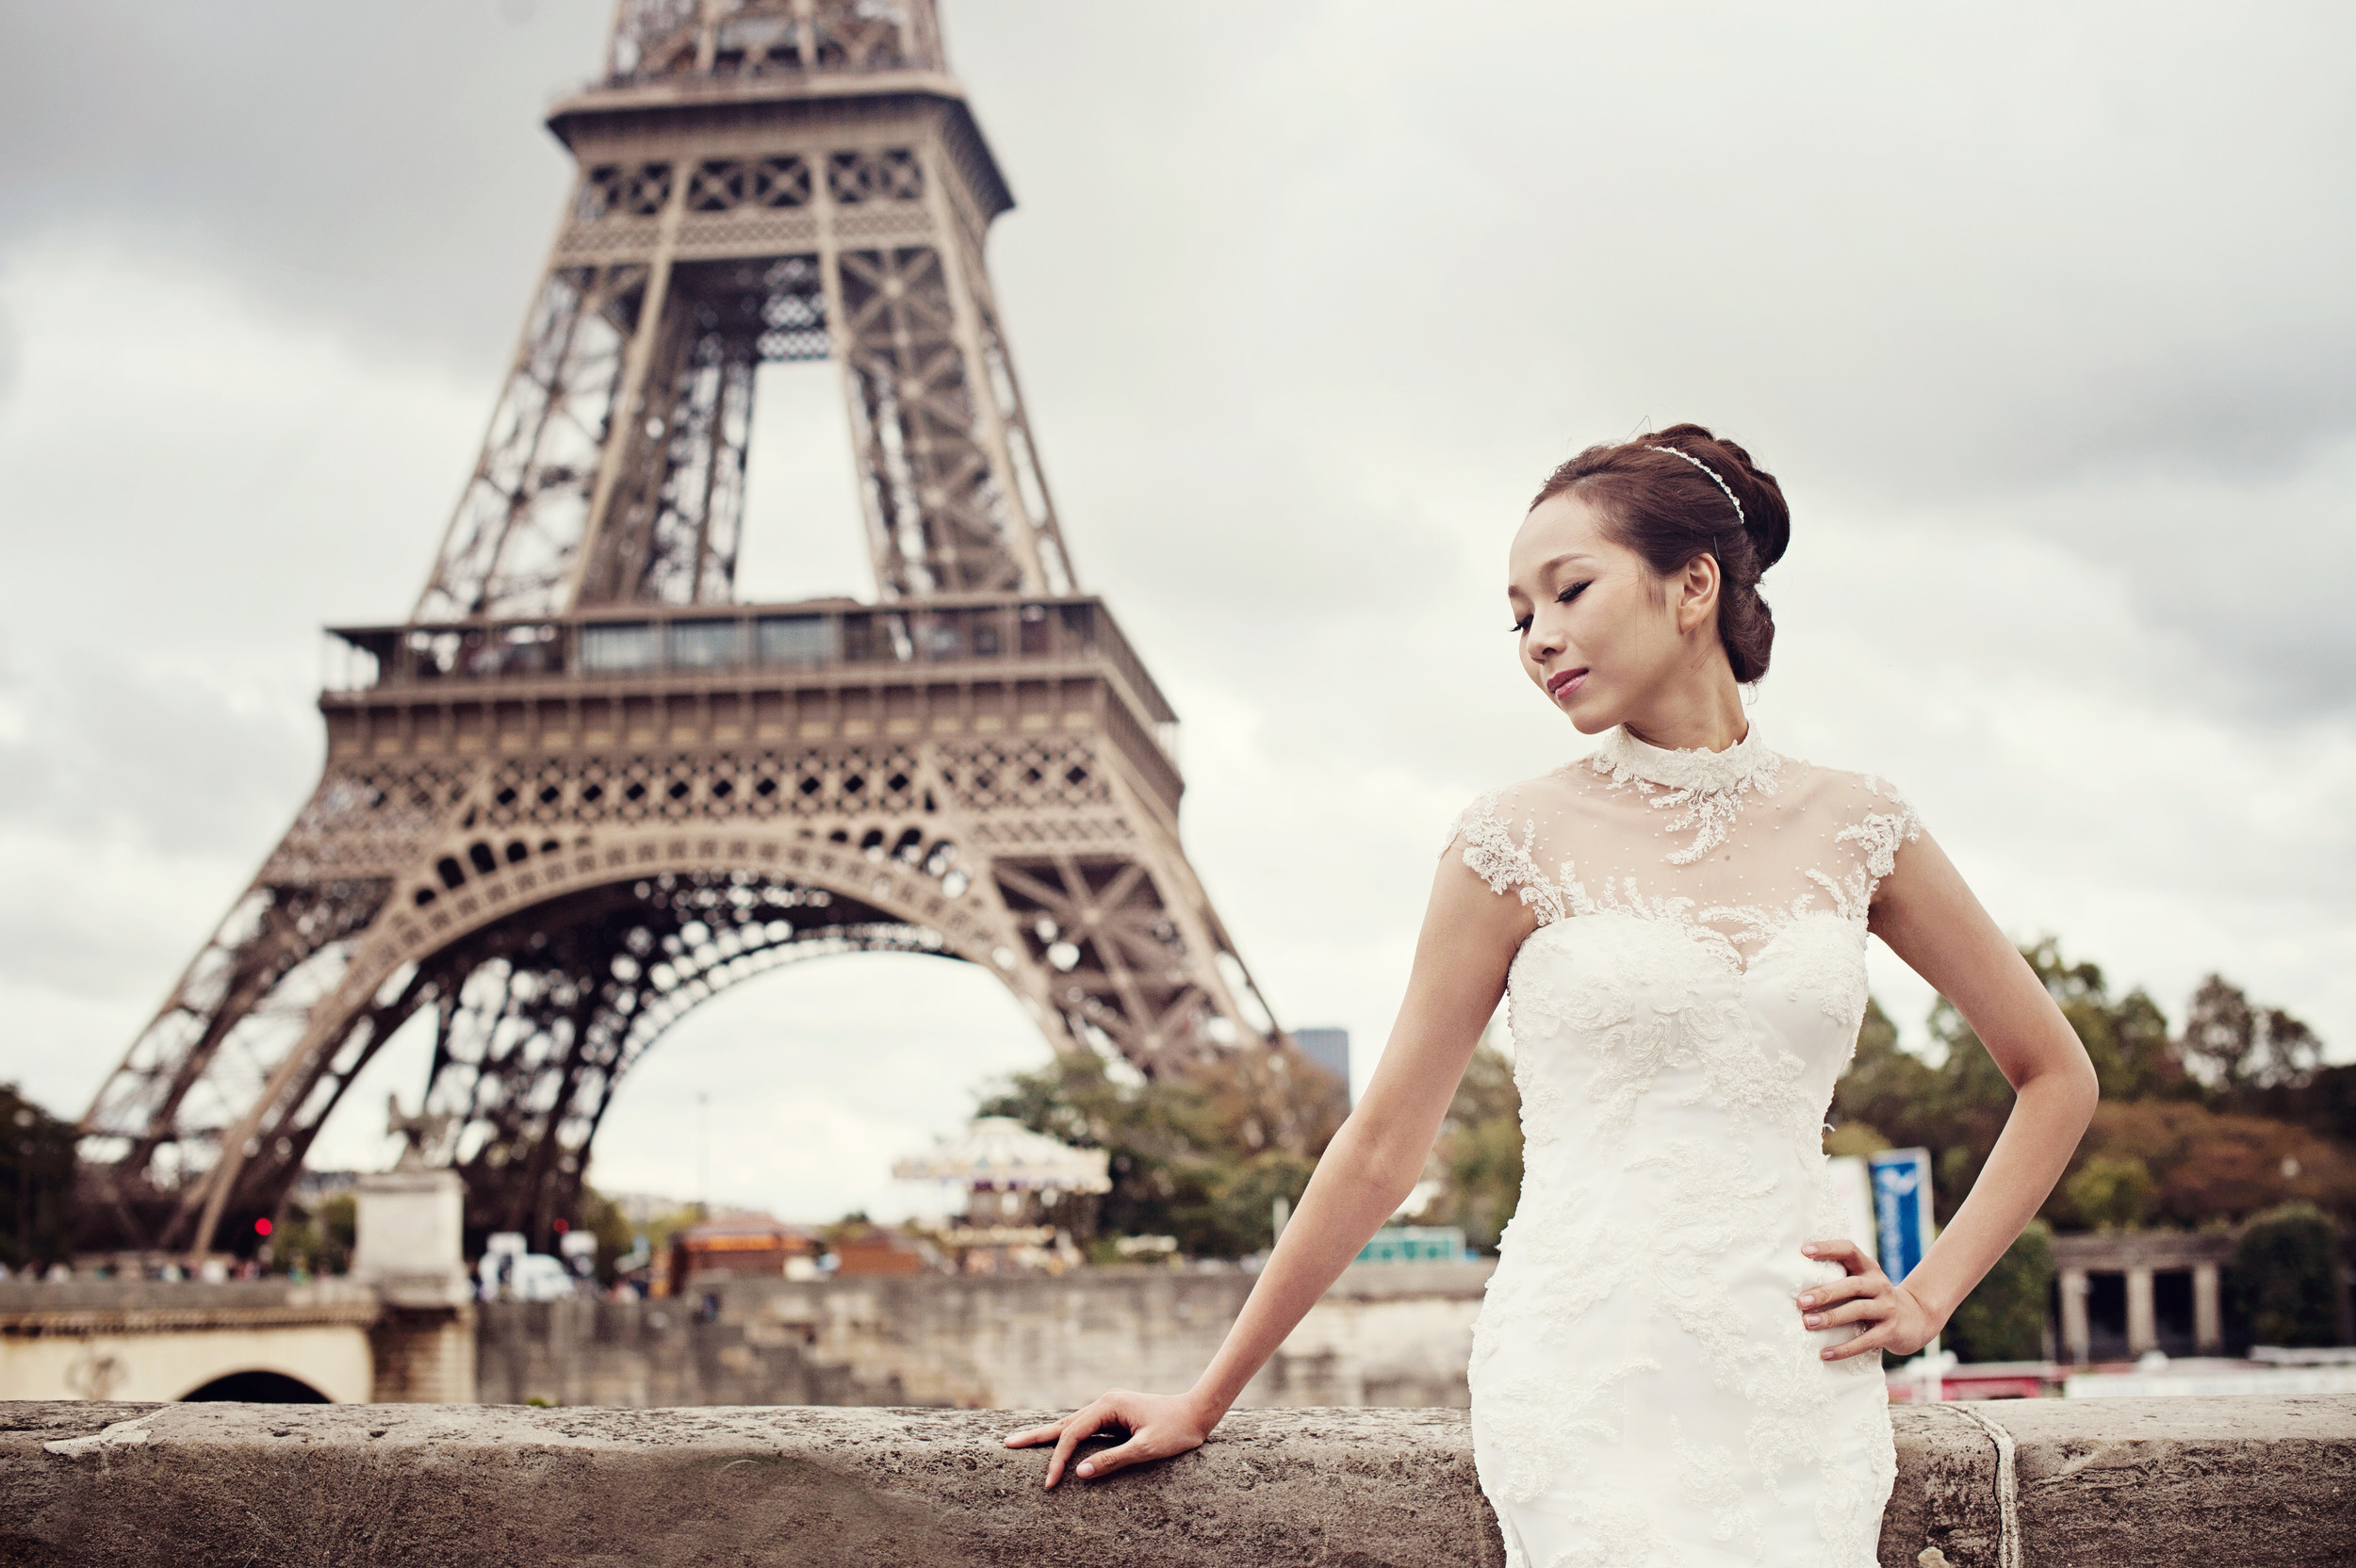 Chris_Hui_Paris_Prewedding_Photography206.jpg